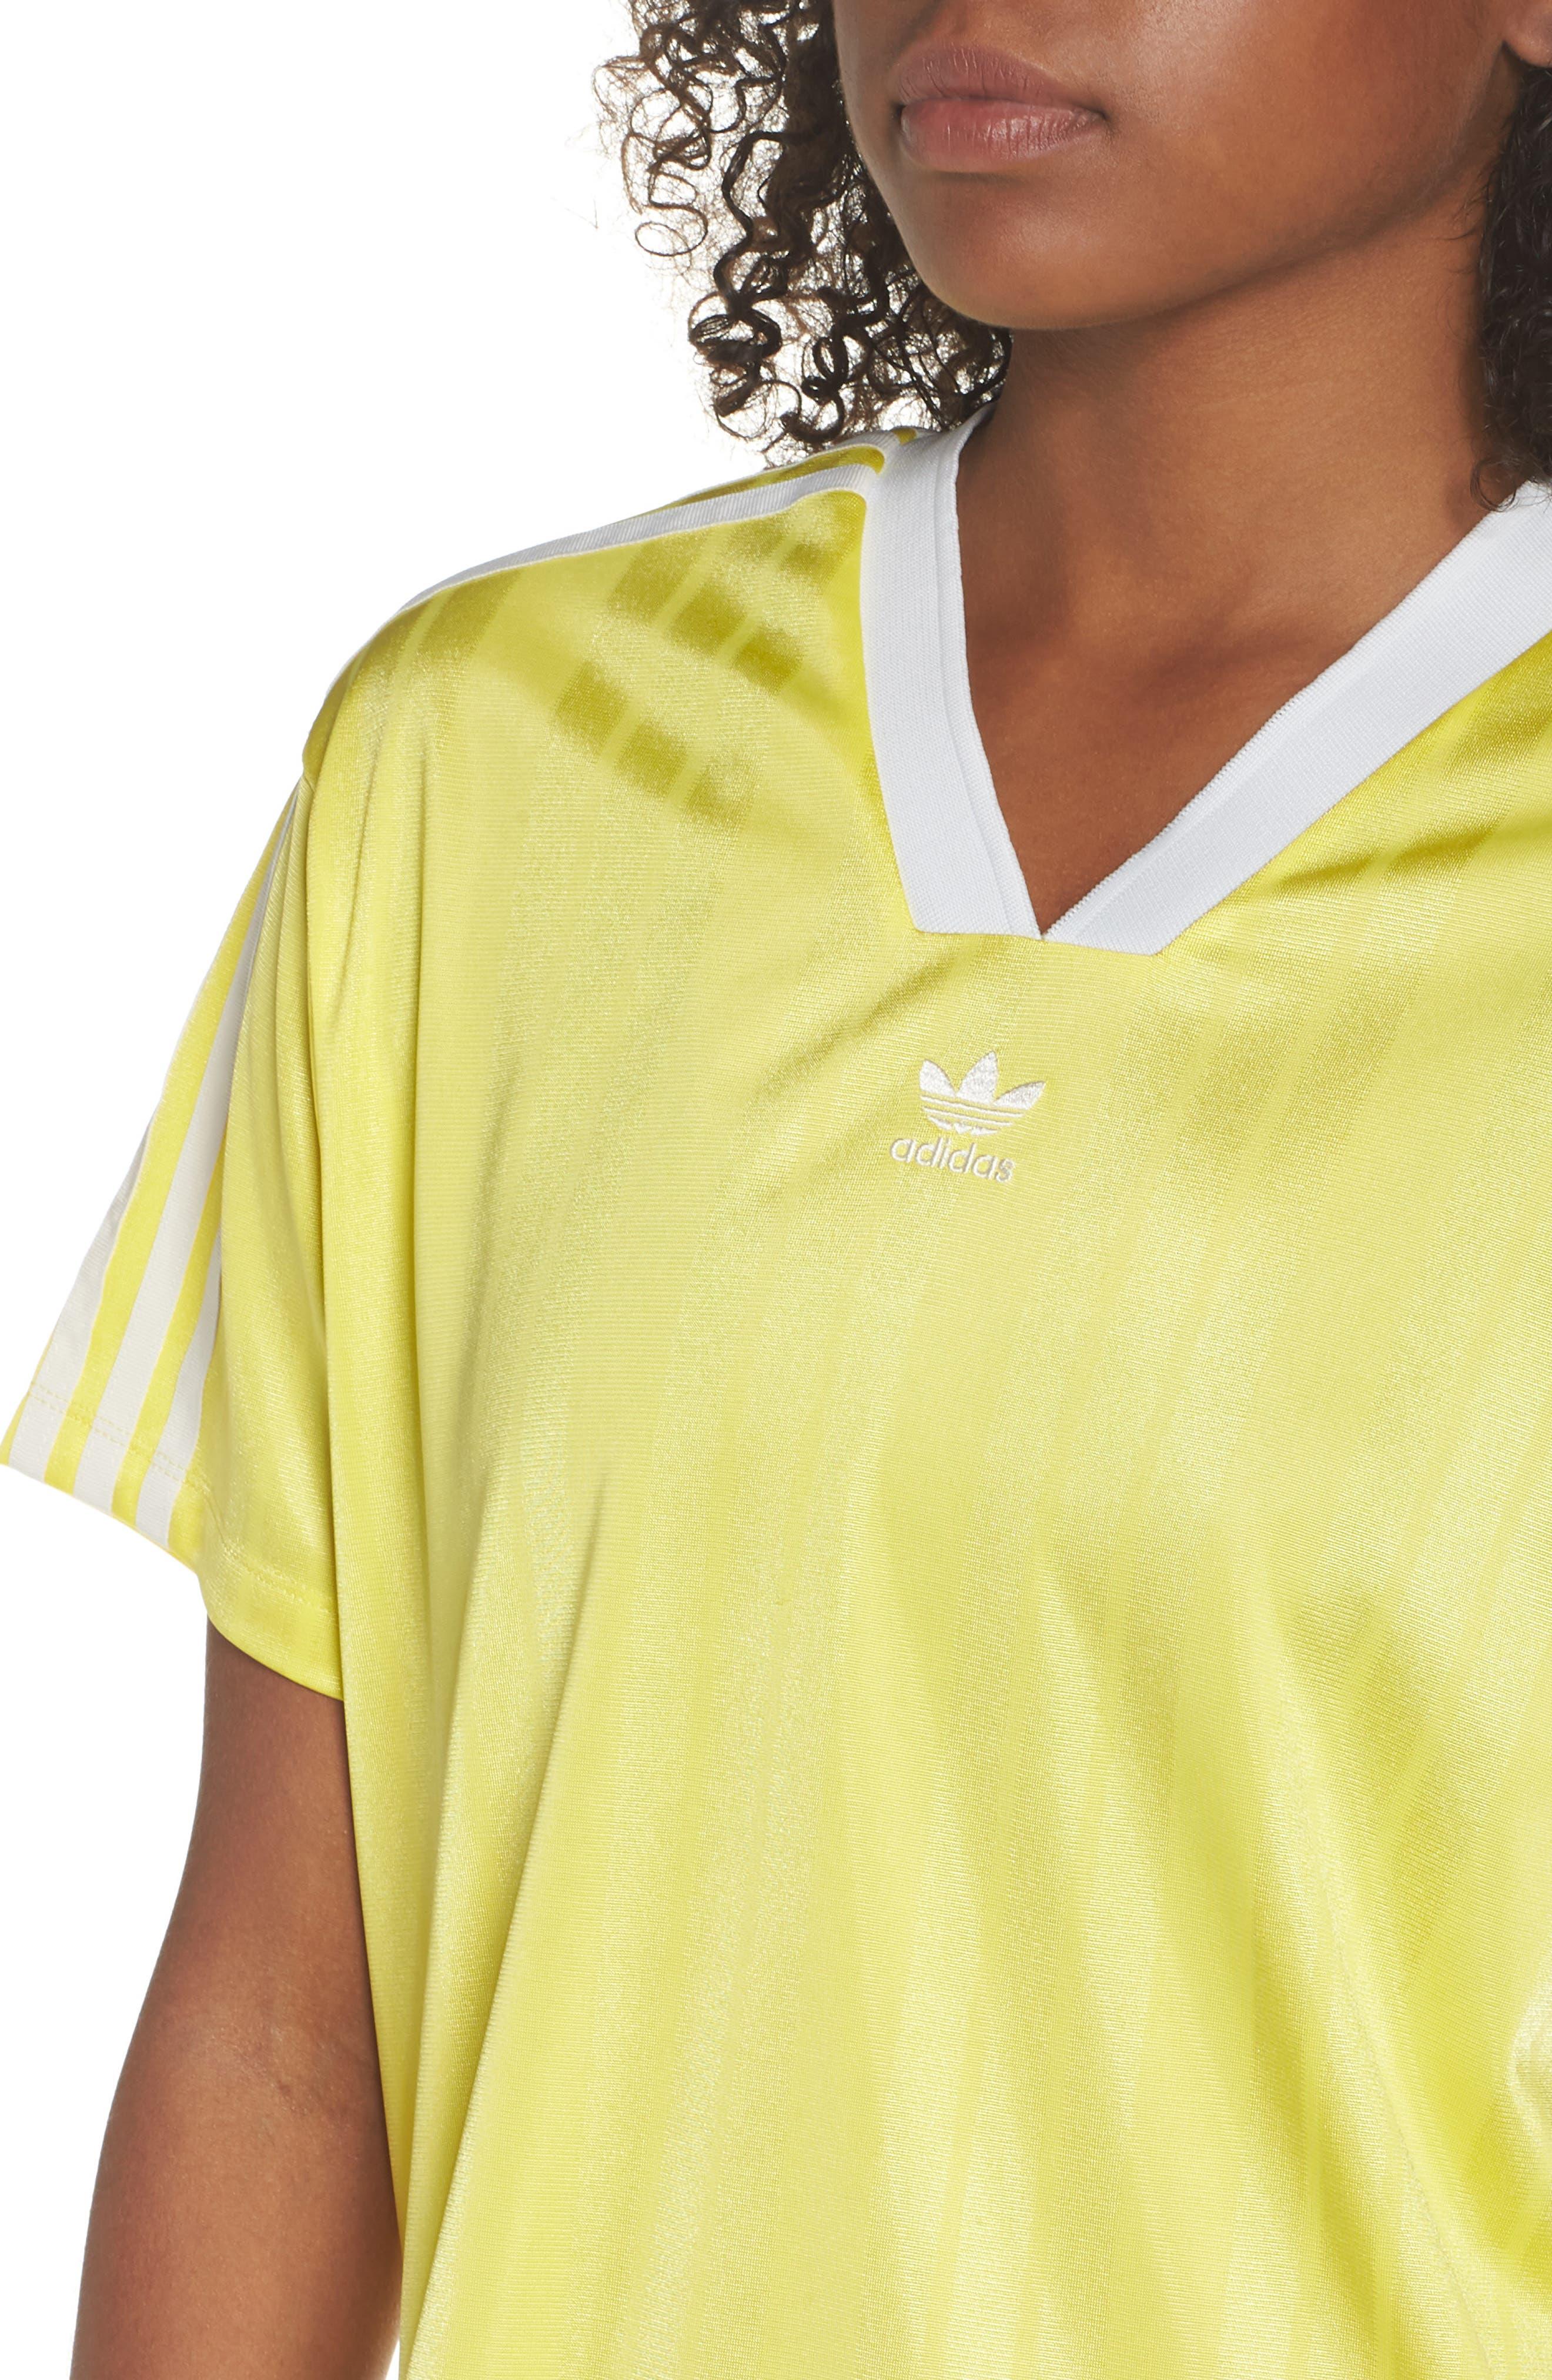 Originals Fashion League Jersey Tee,                             Alternate thumbnail 4, color,                             Prime Yellow